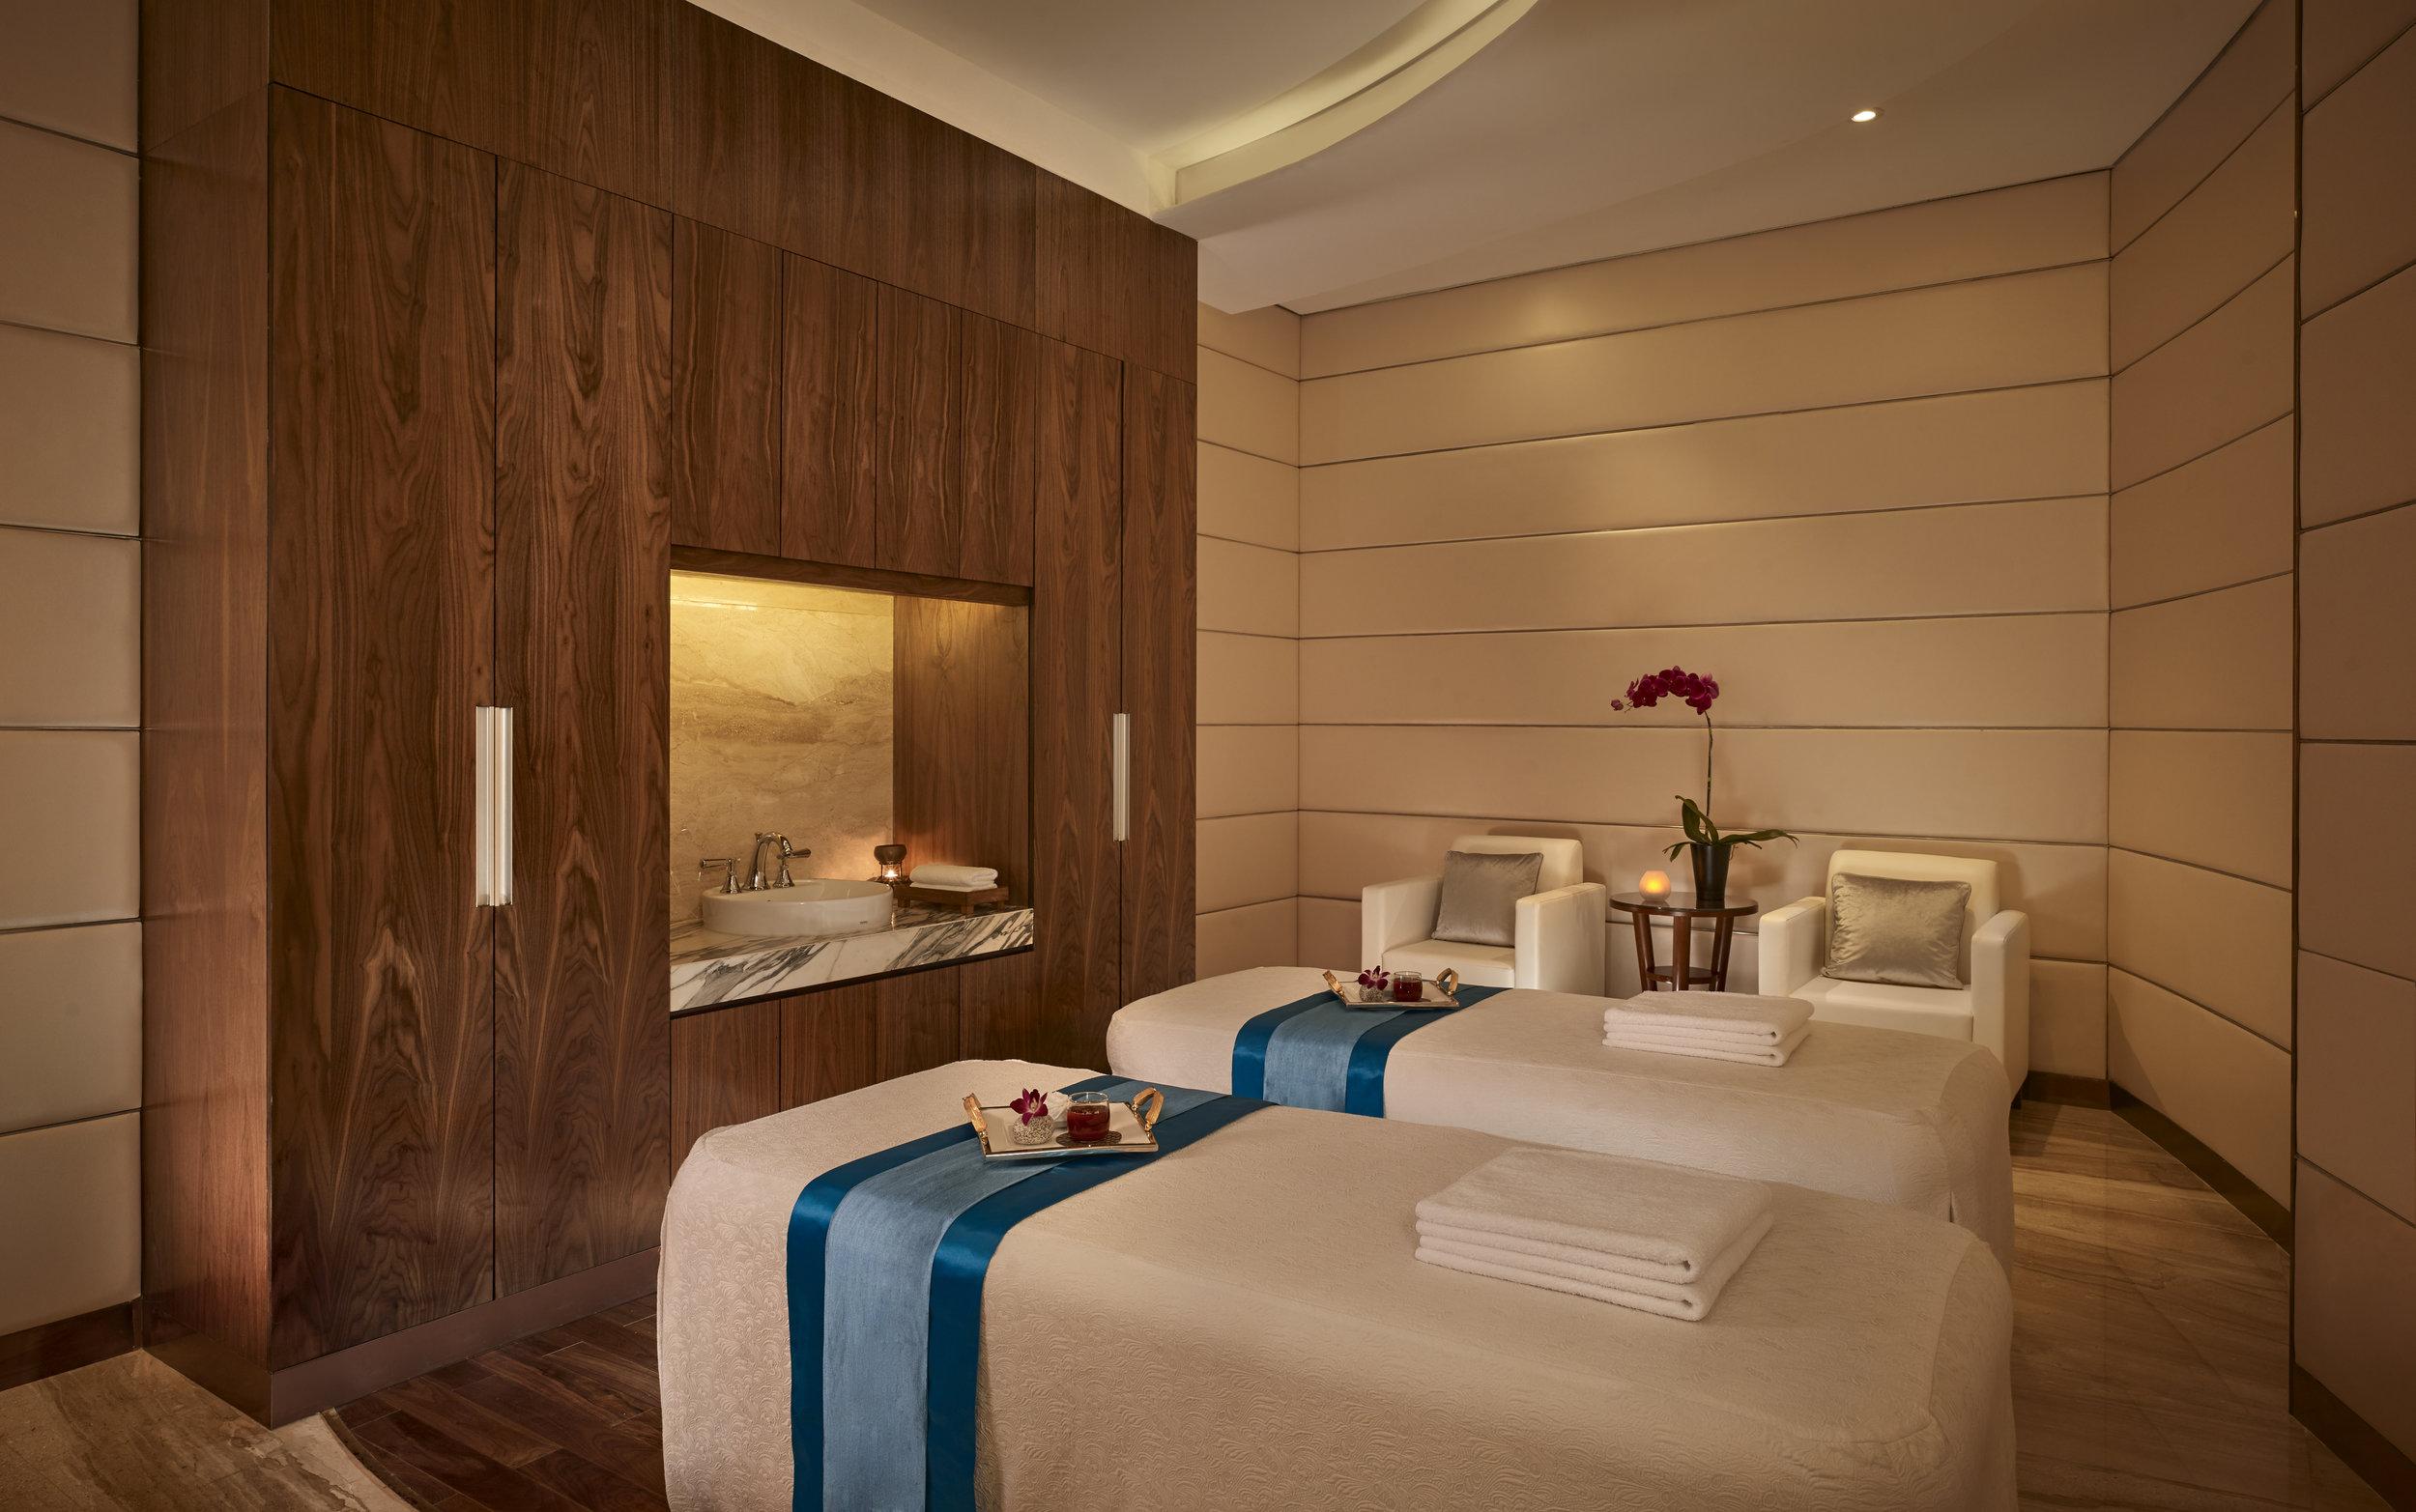 The Reverie Saigon - The Spa - Treatment Room.jpg